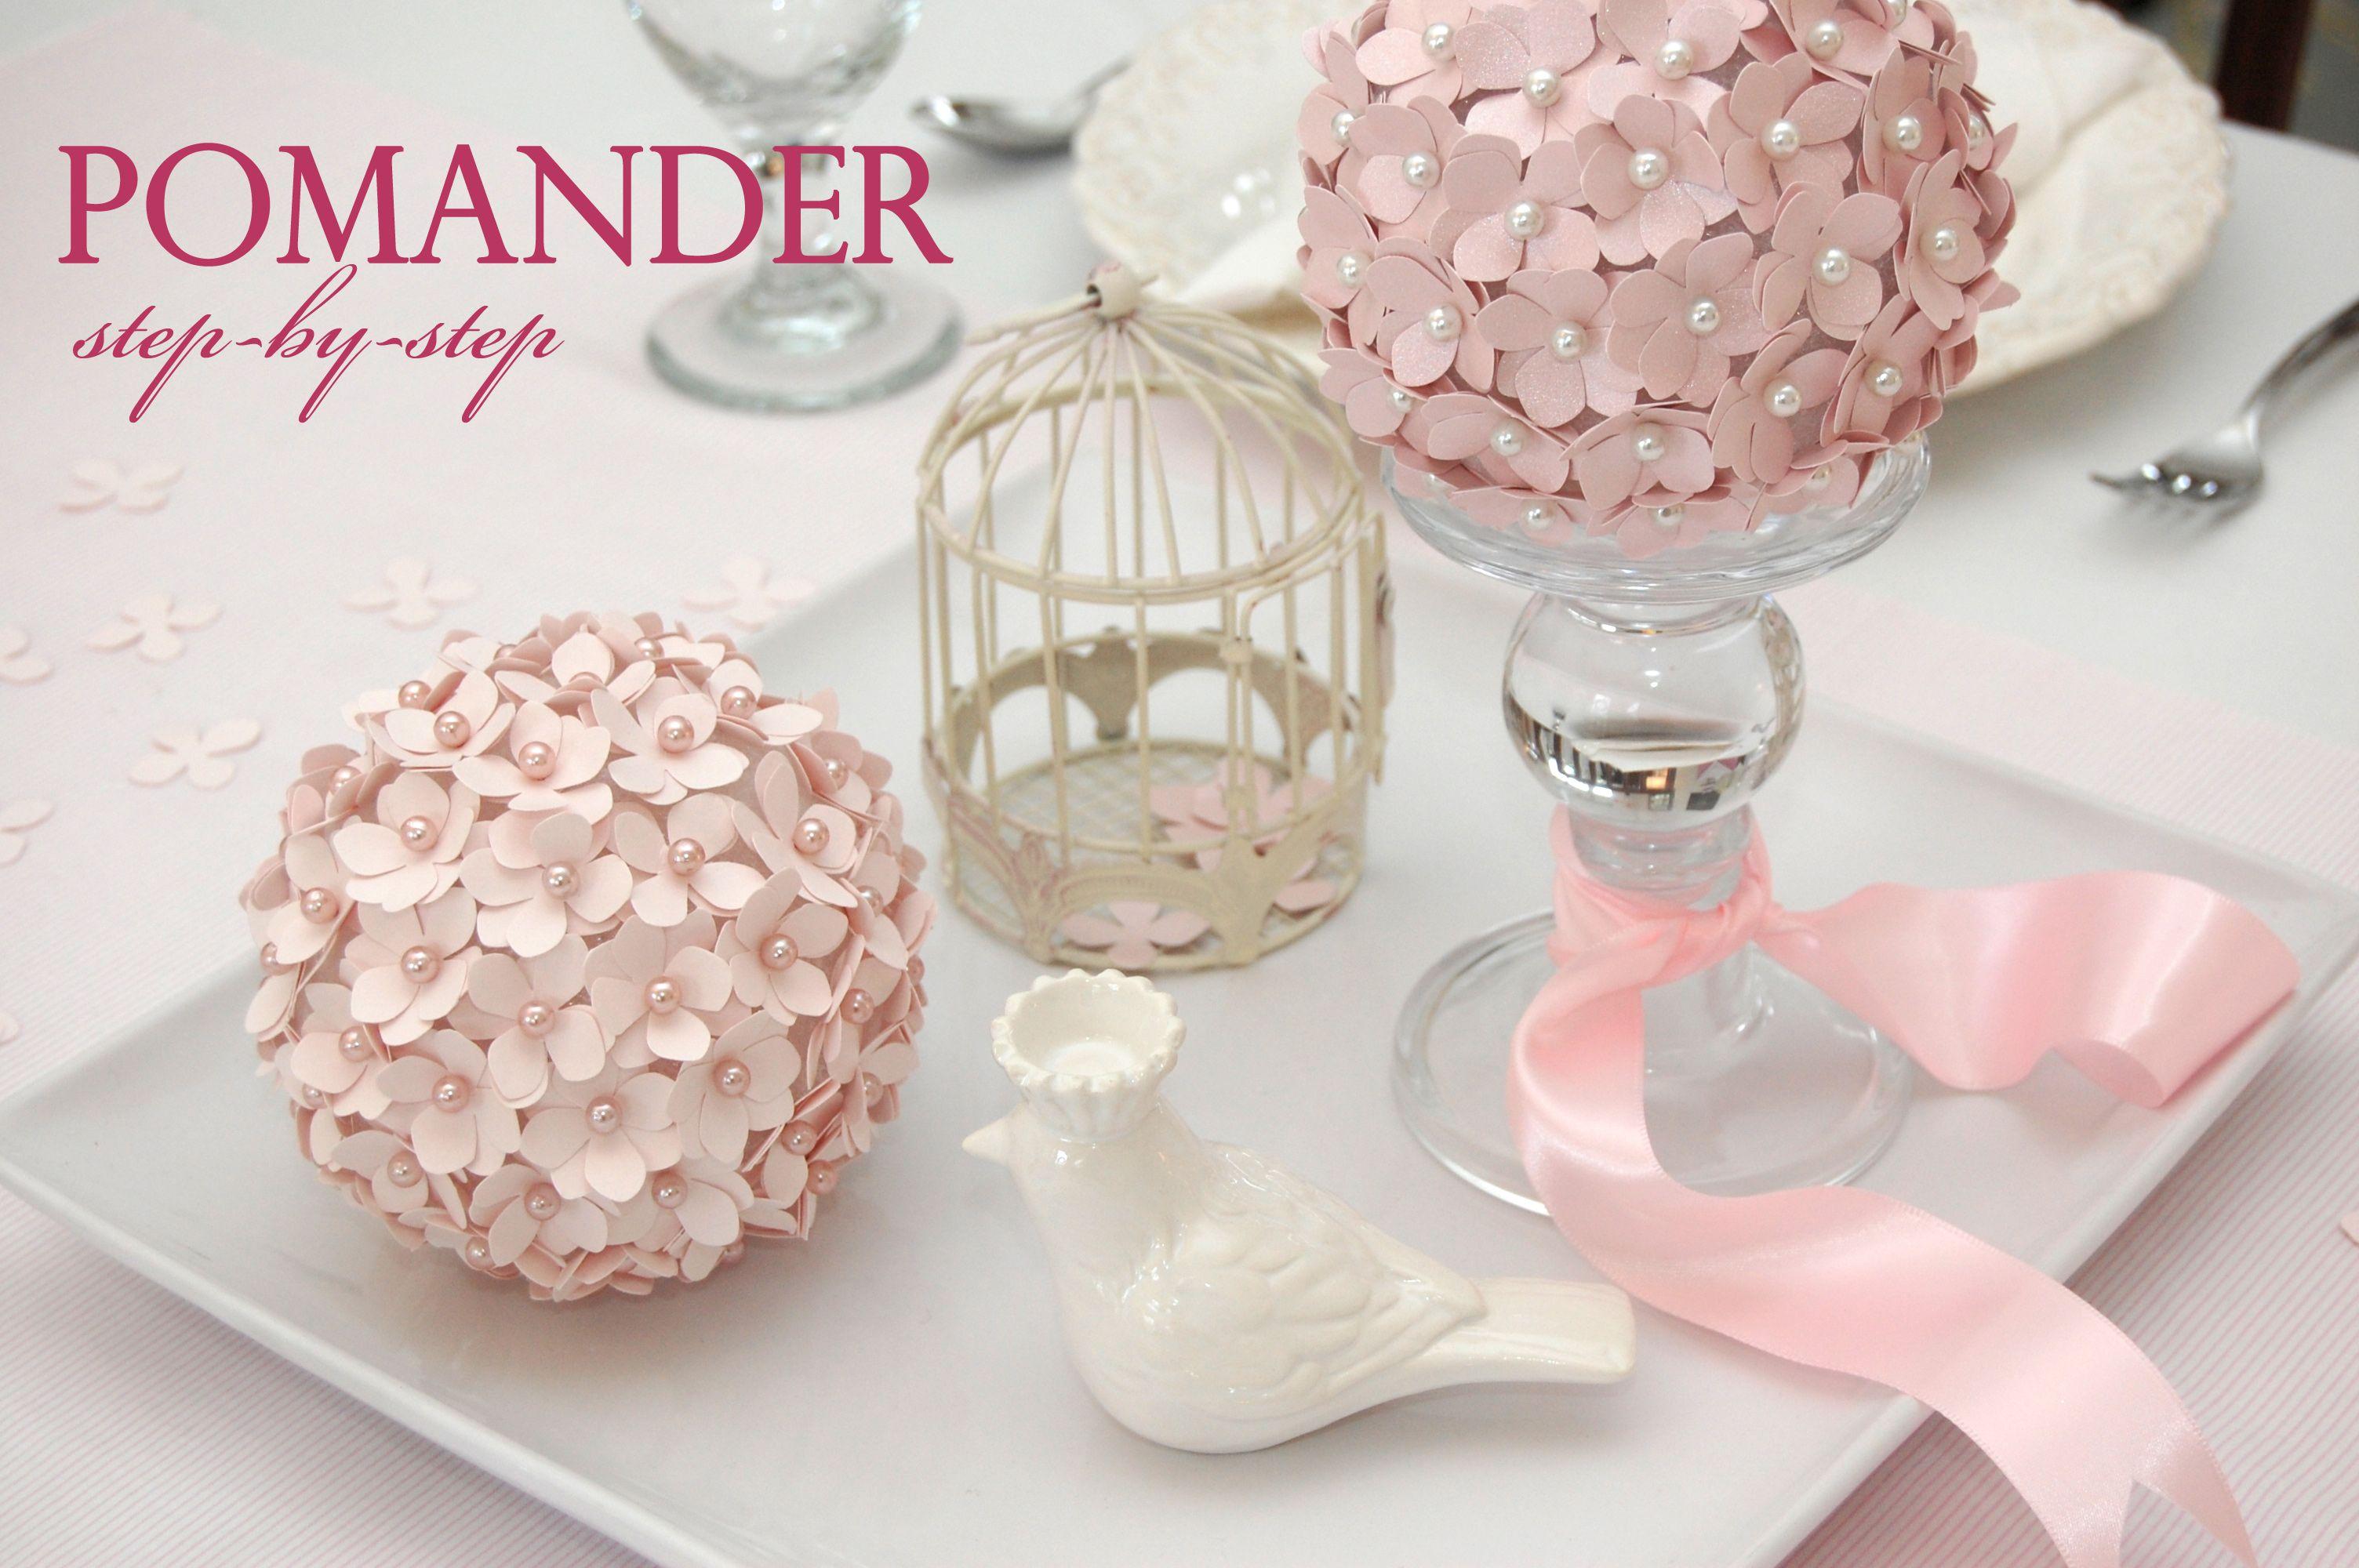 Diy wedding shower decorations  pomanderstepbystepdiy  Wedding Ideas  Pinterest  Showers DIY